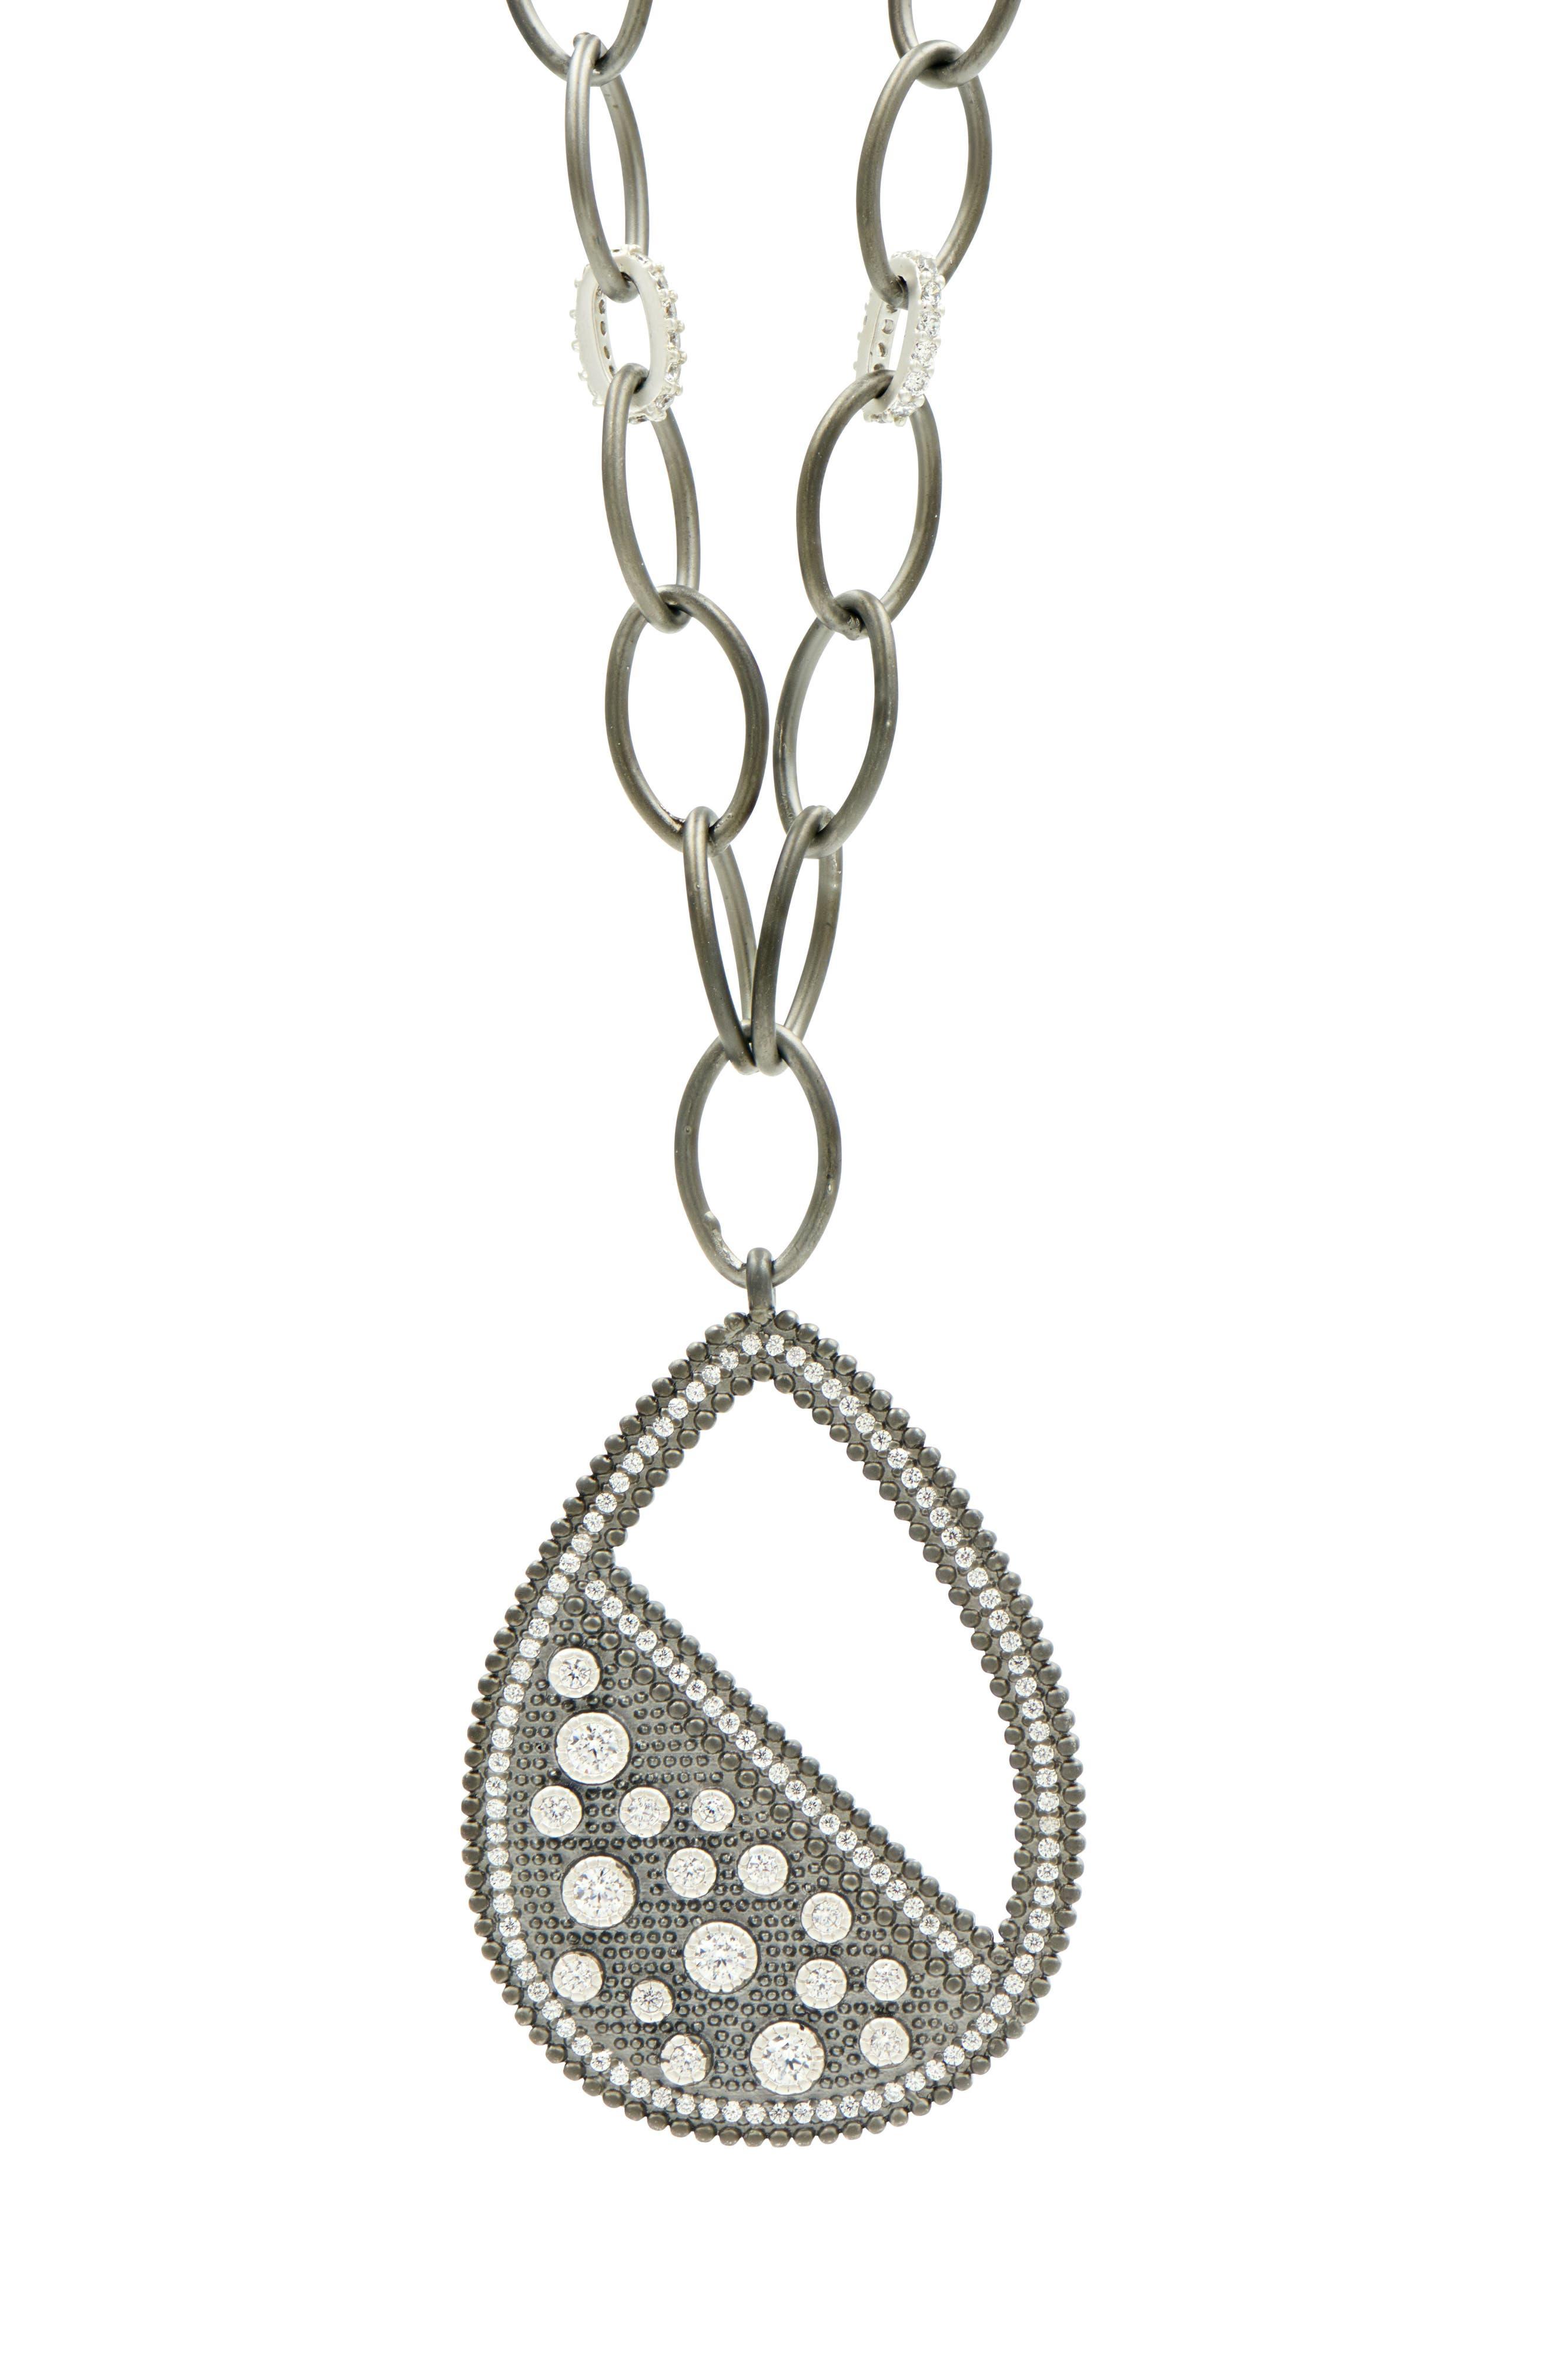 Industrial Finish Teardrop Necklace,                             Alternate thumbnail 4, color,                             Silver/ Black Rhodium